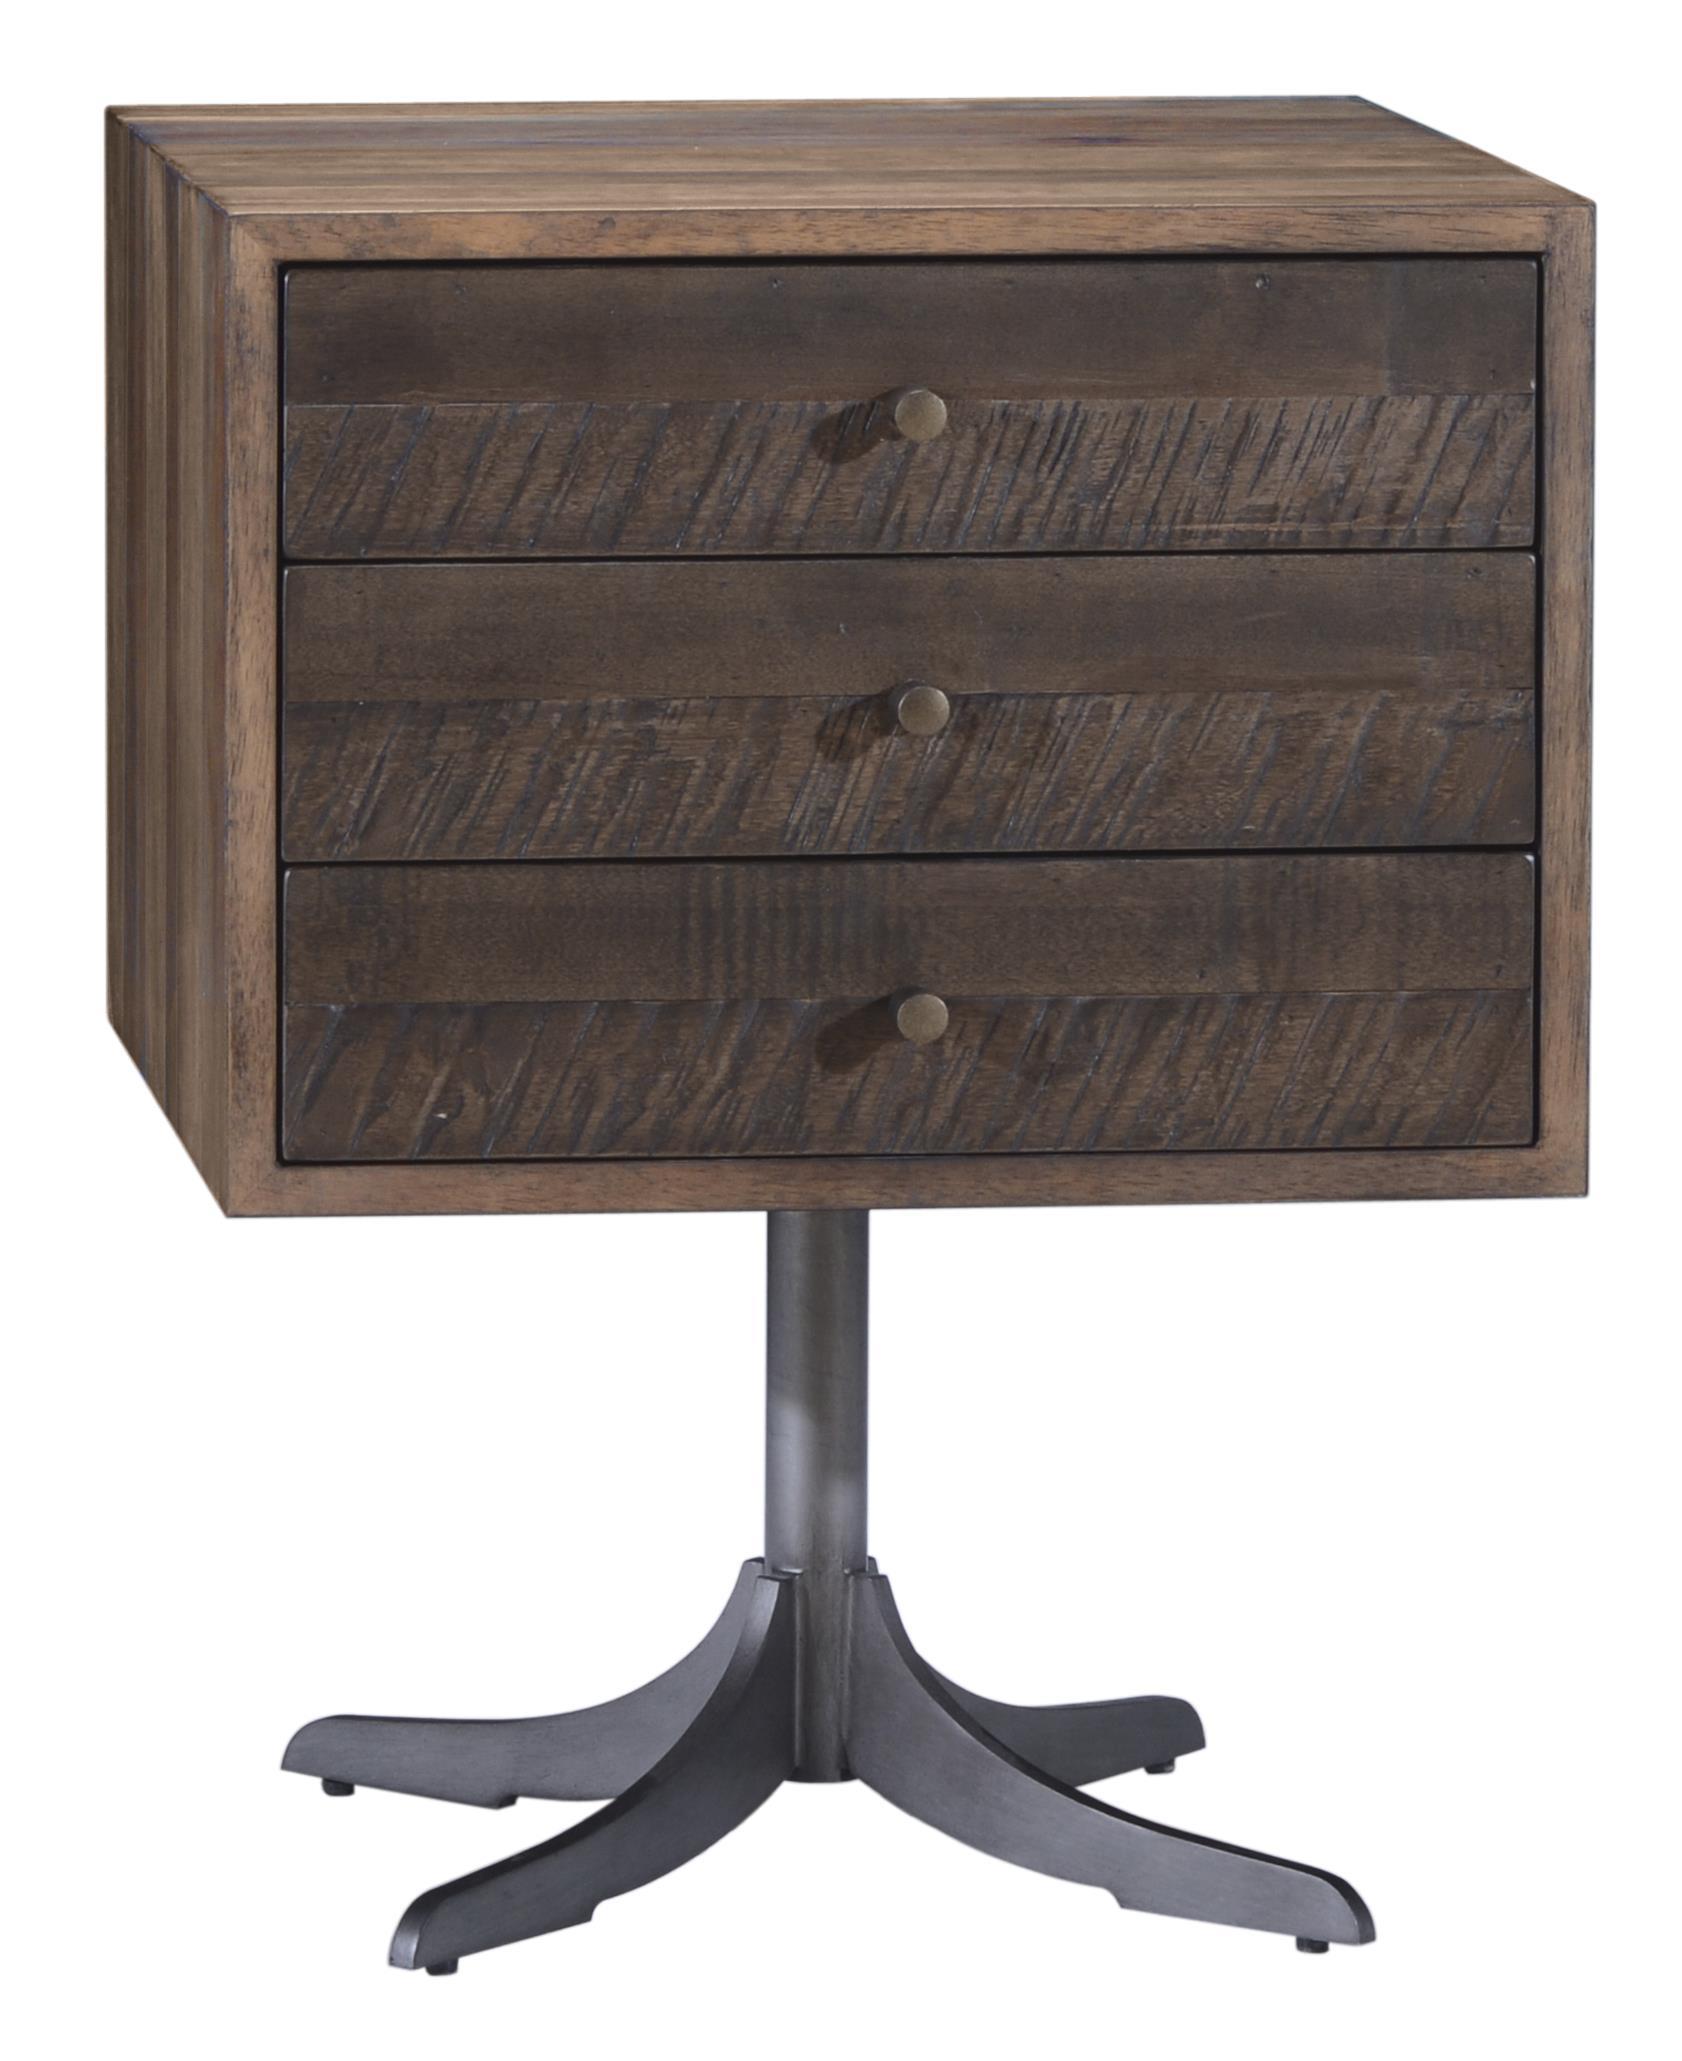 Belfort Signature Urban Treasures Shaw Pedestal End Table - Item Number: 223304-2302